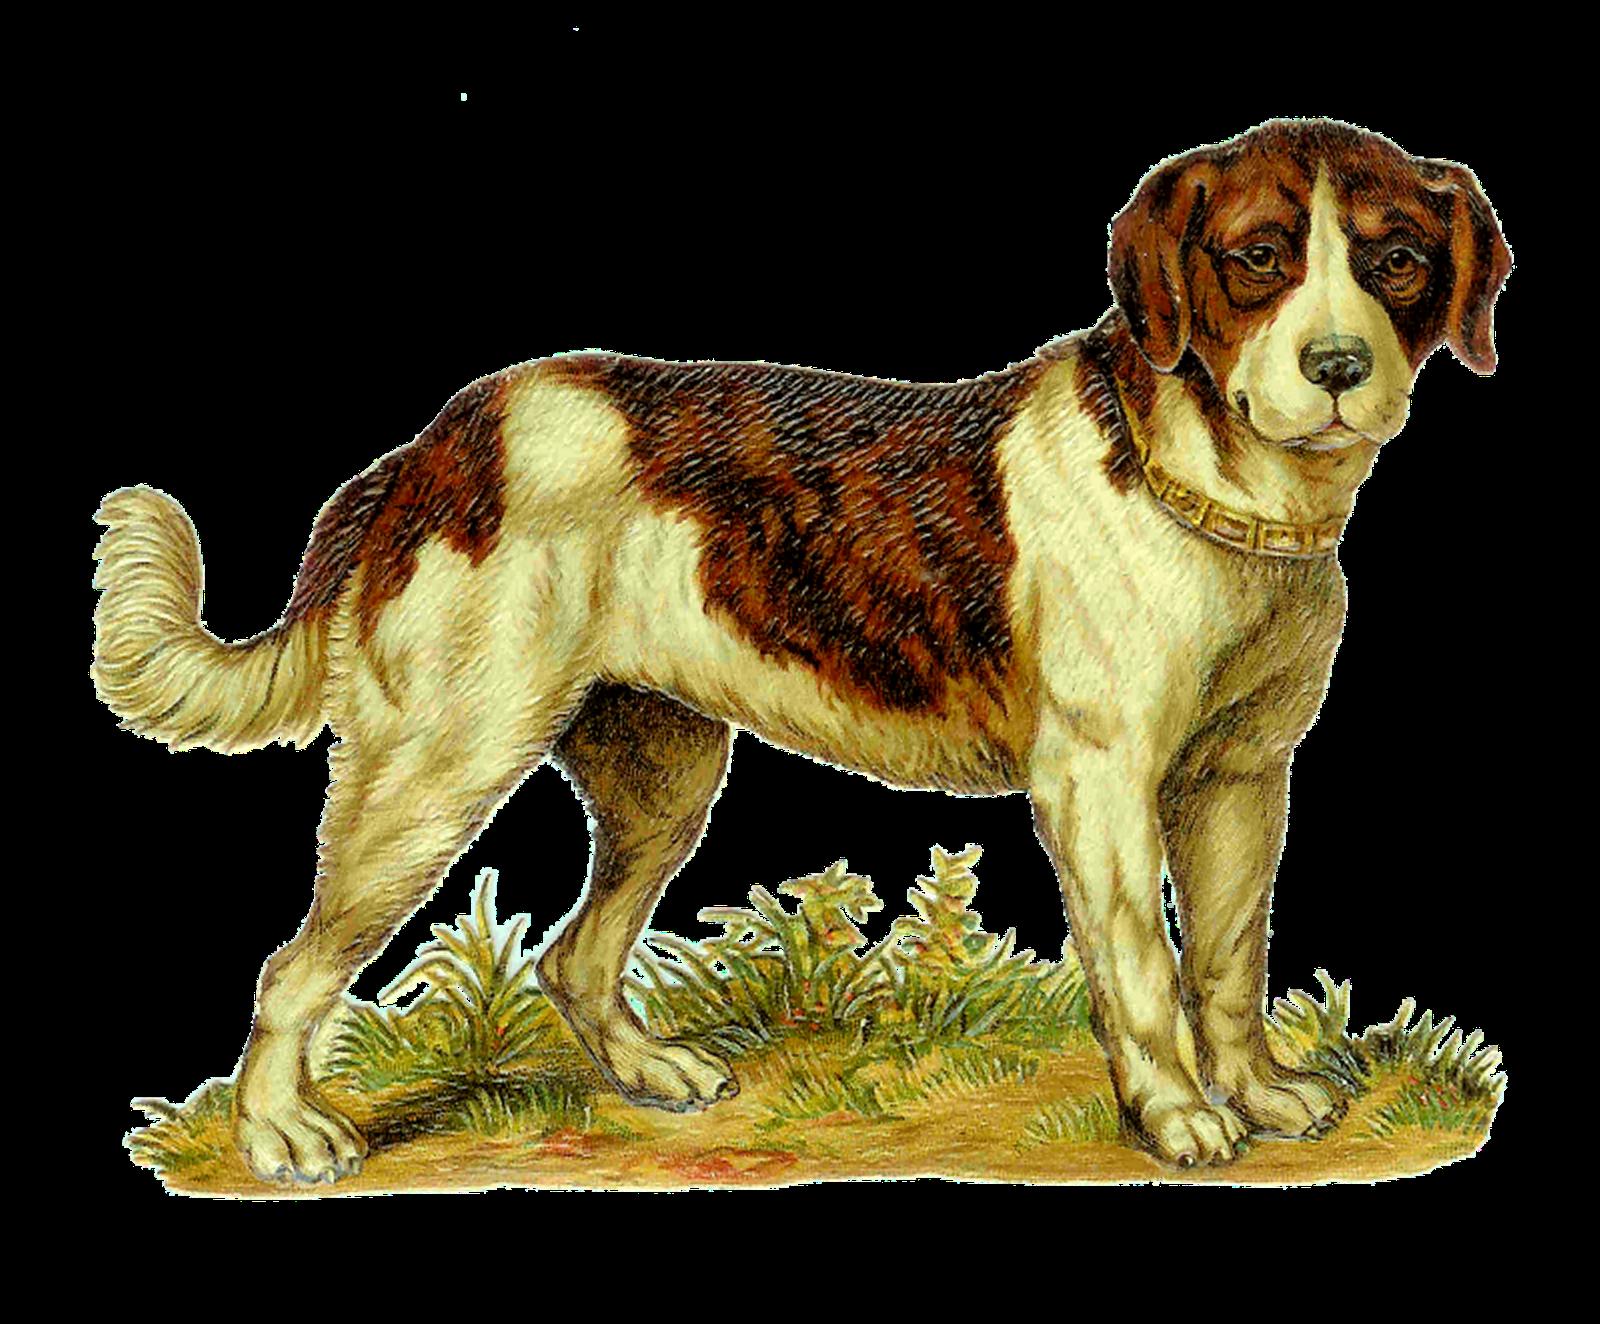 Saint bernard dog clipart jpg free Antique Images: Vintage Dog Clip Art: Victorian Die Cut of St ... jpg free